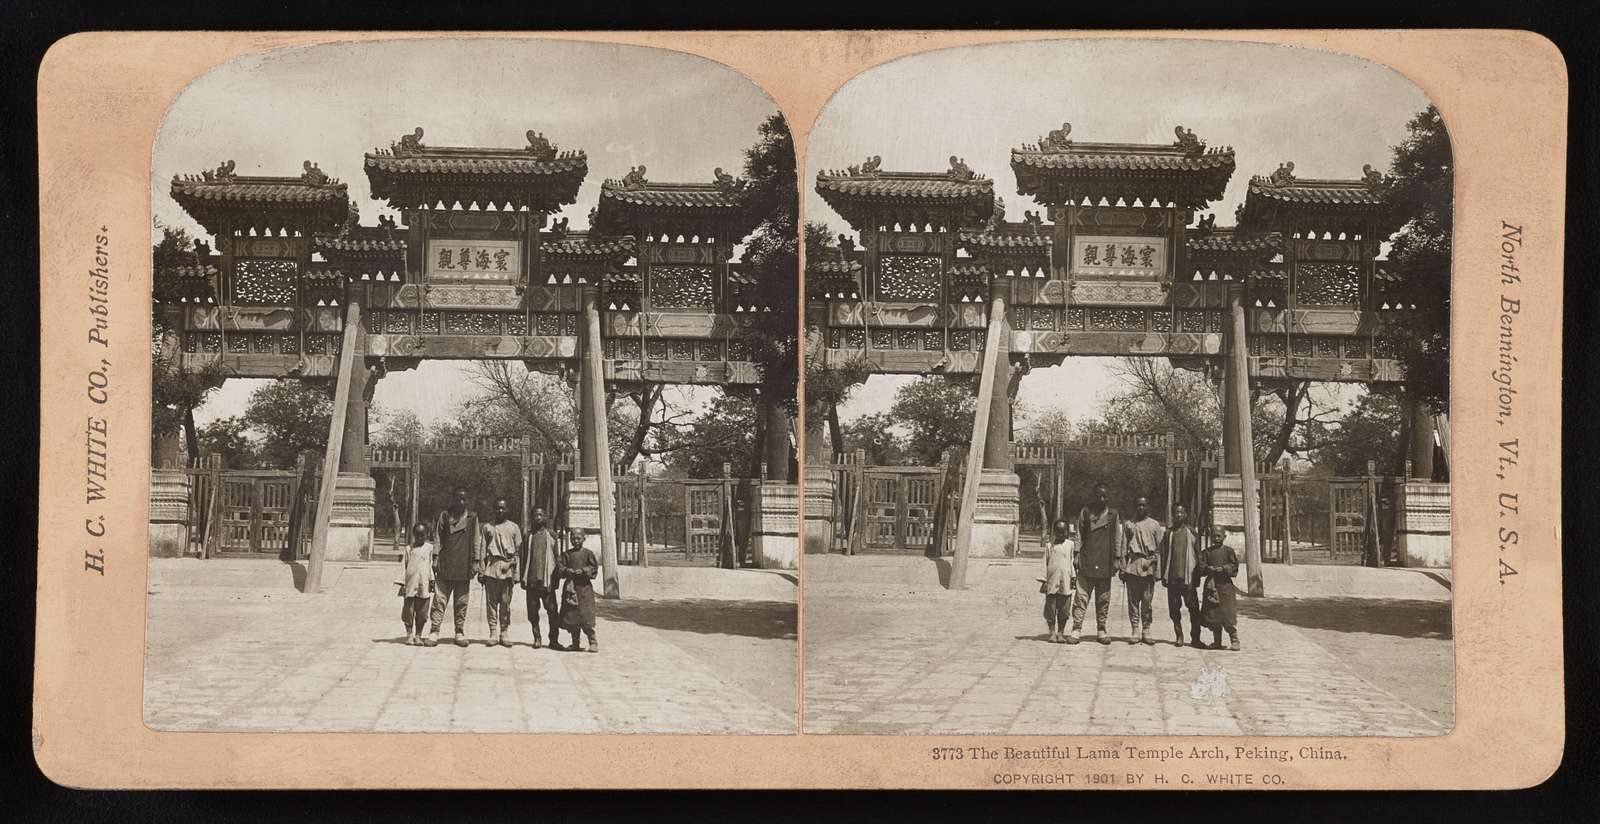 The beautiful Lama Temple Arch, Peking, China